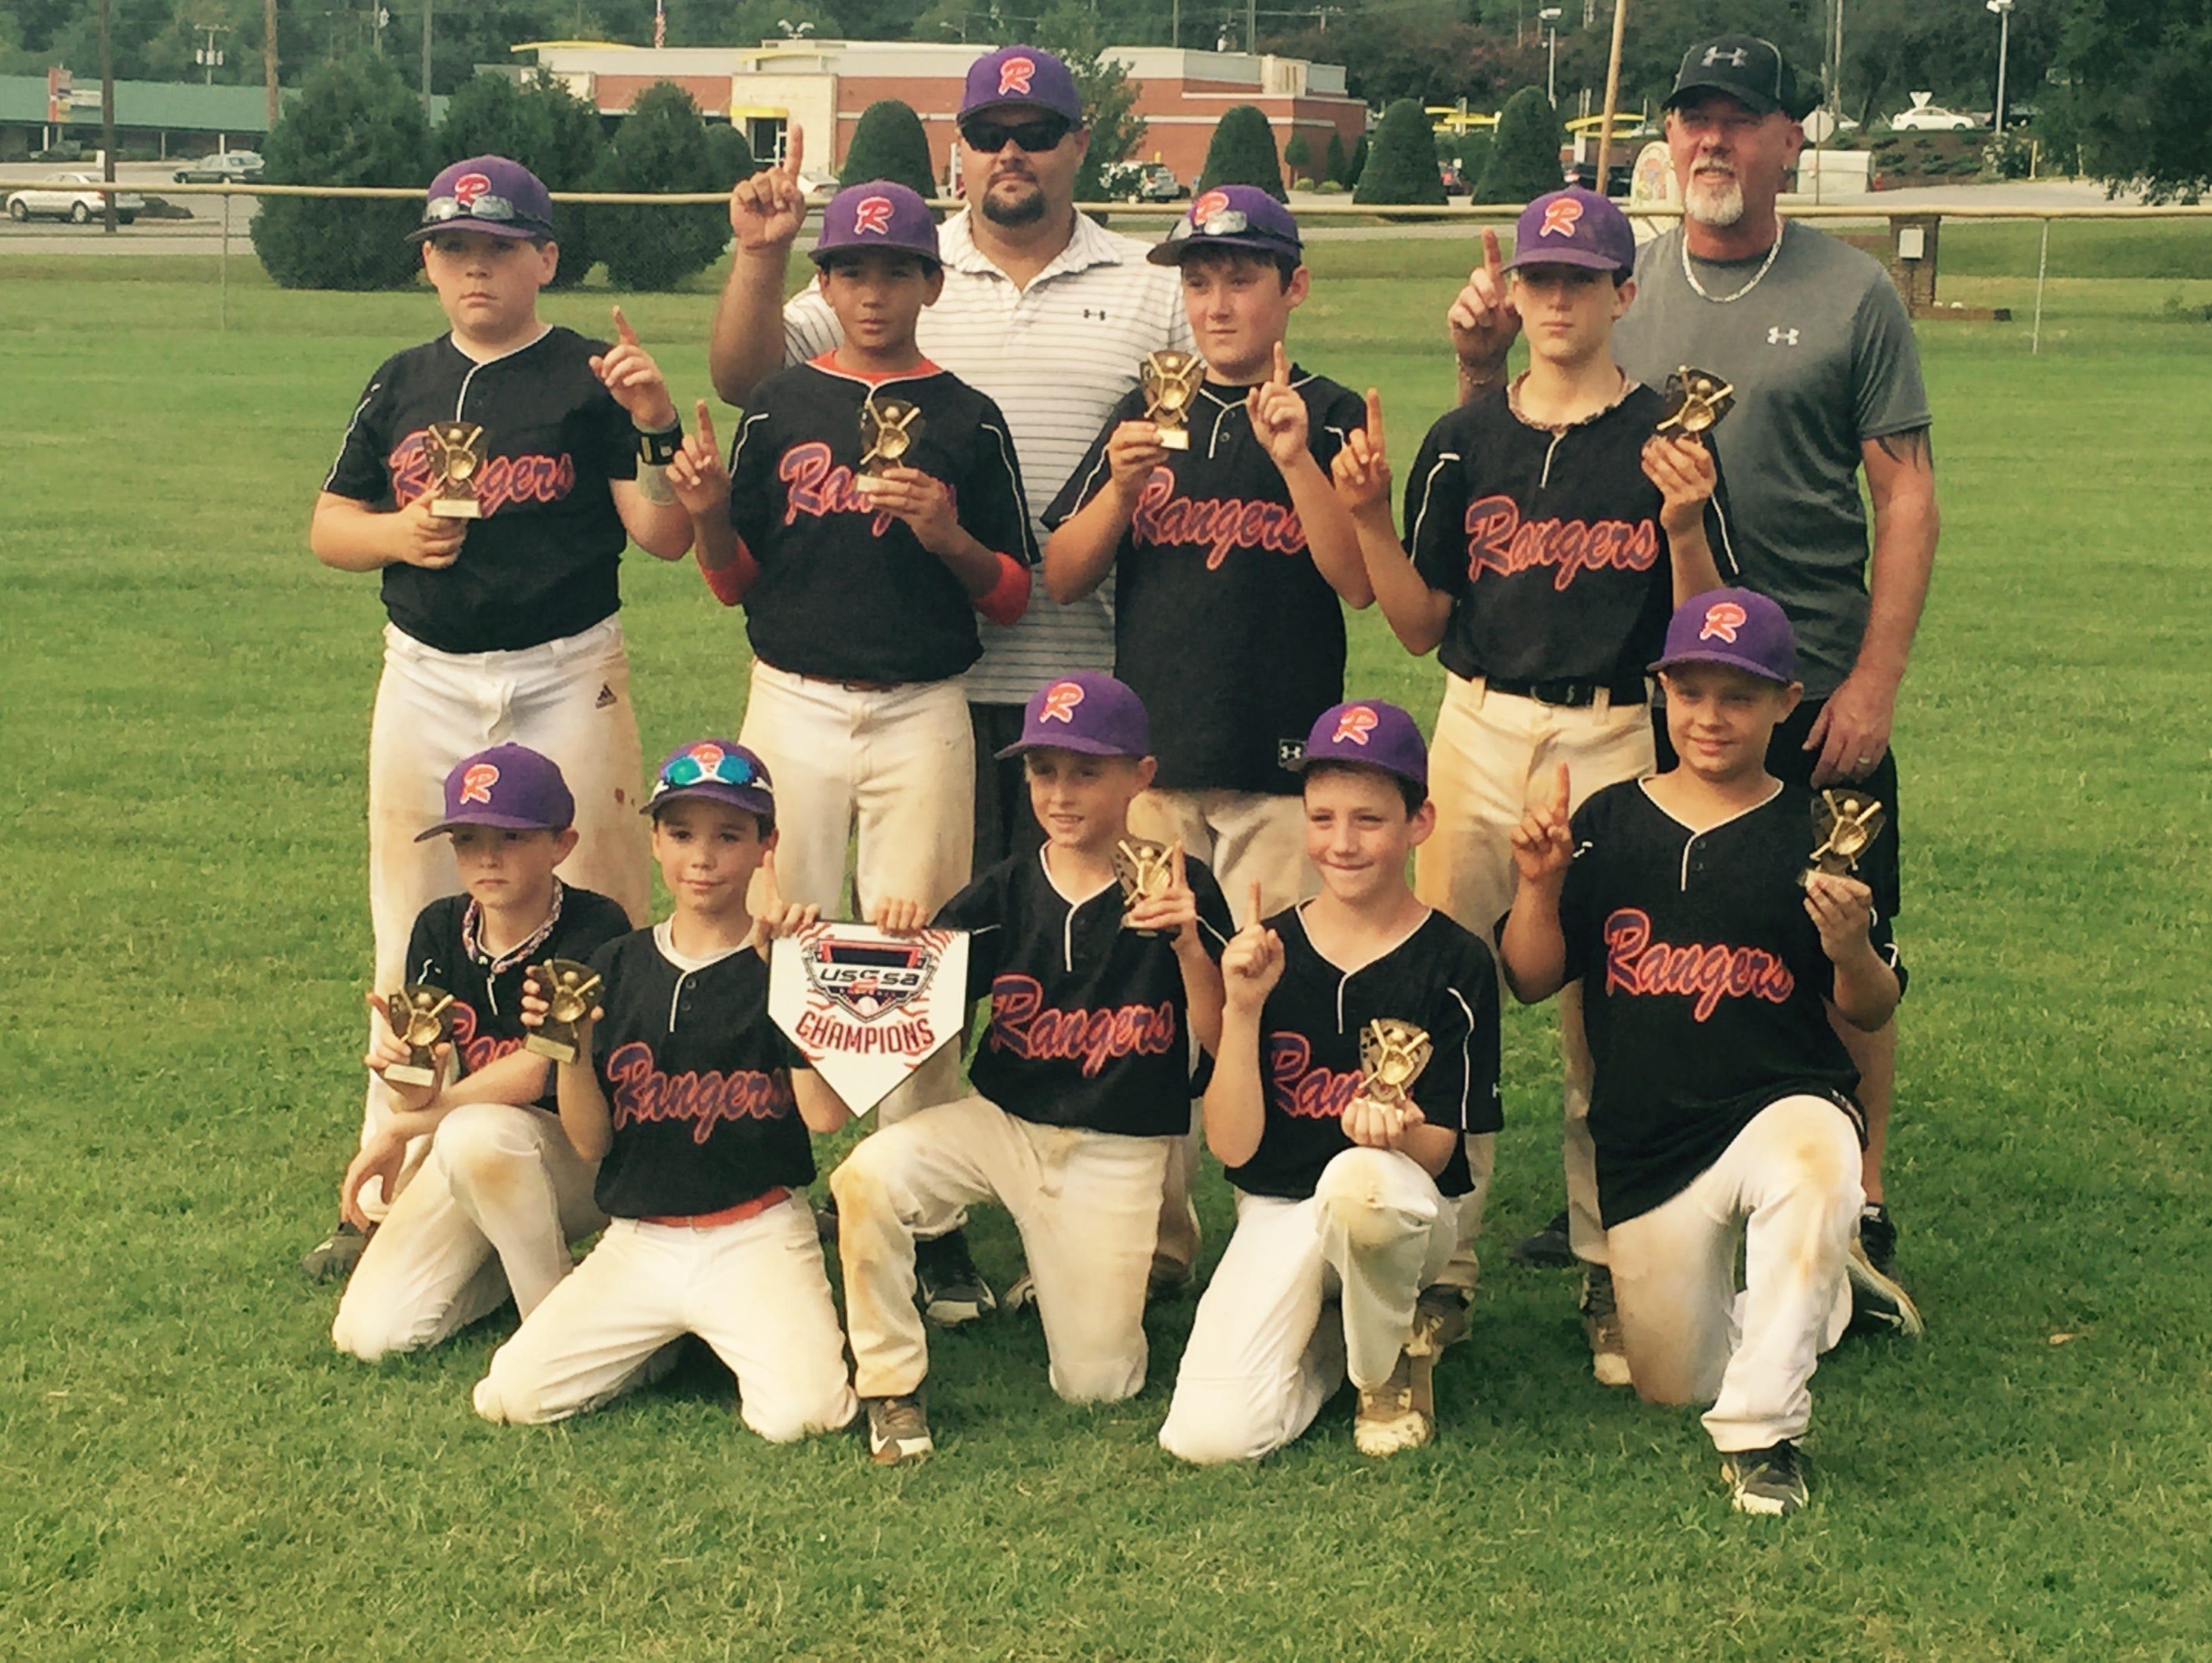 The Blue Ridge Rangers 12U baseball team.